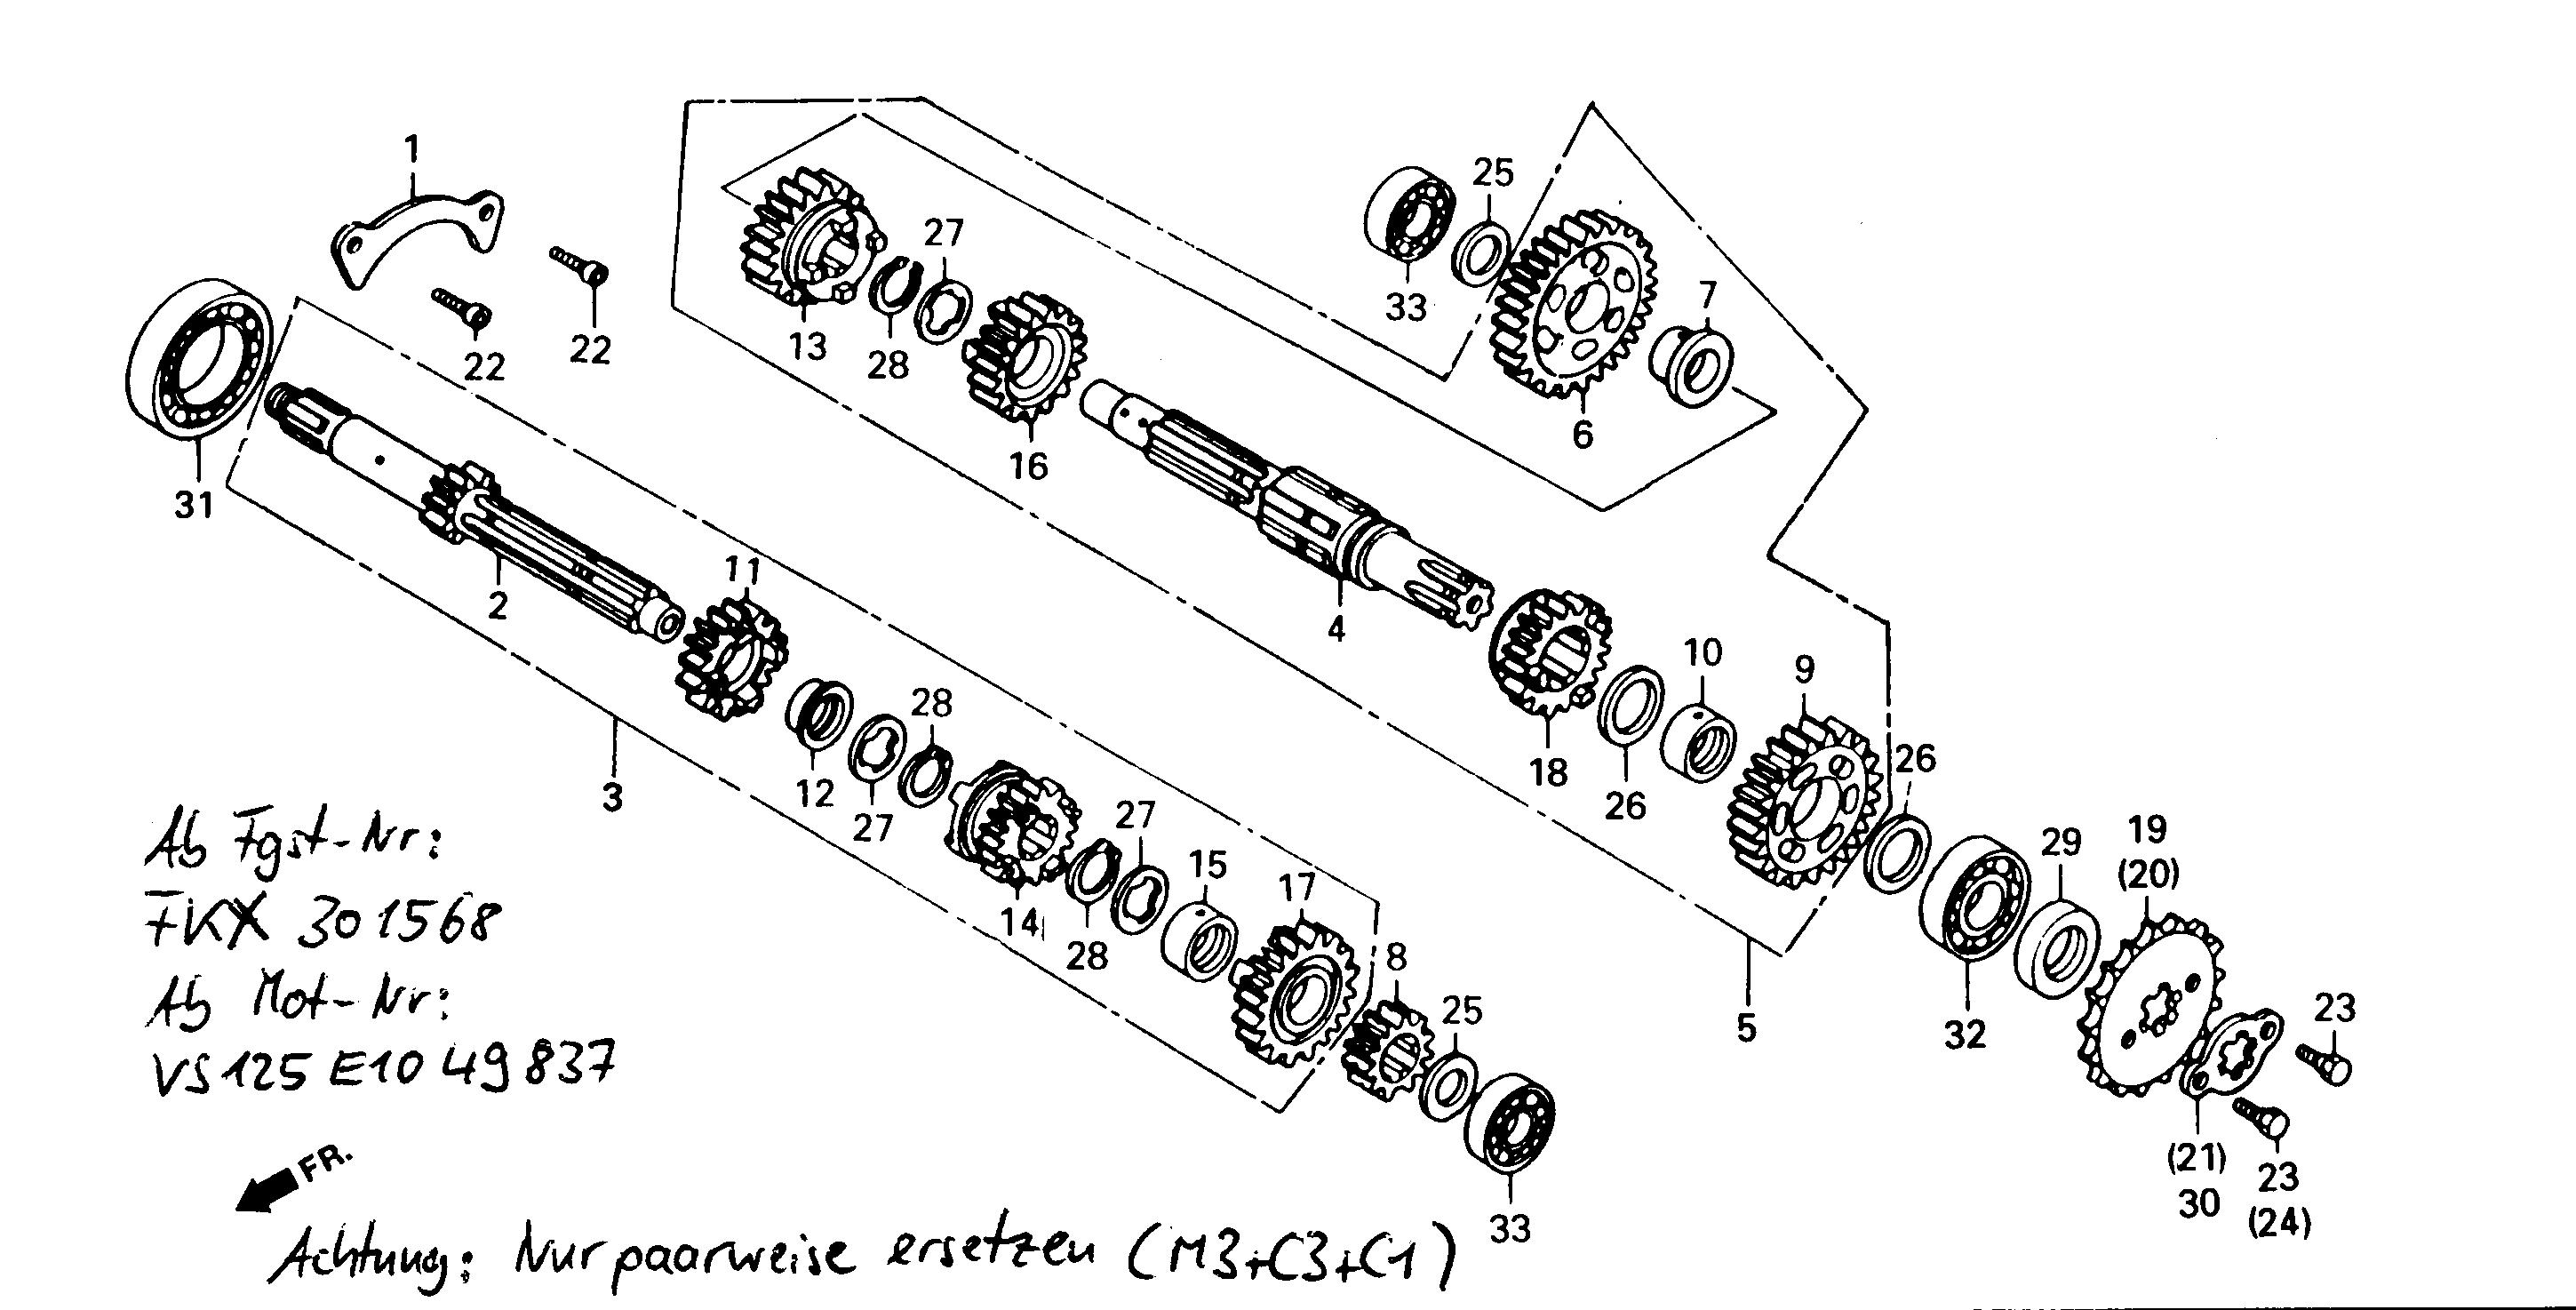 Getriebe ab FgNr.:KMYVS125FKX301568